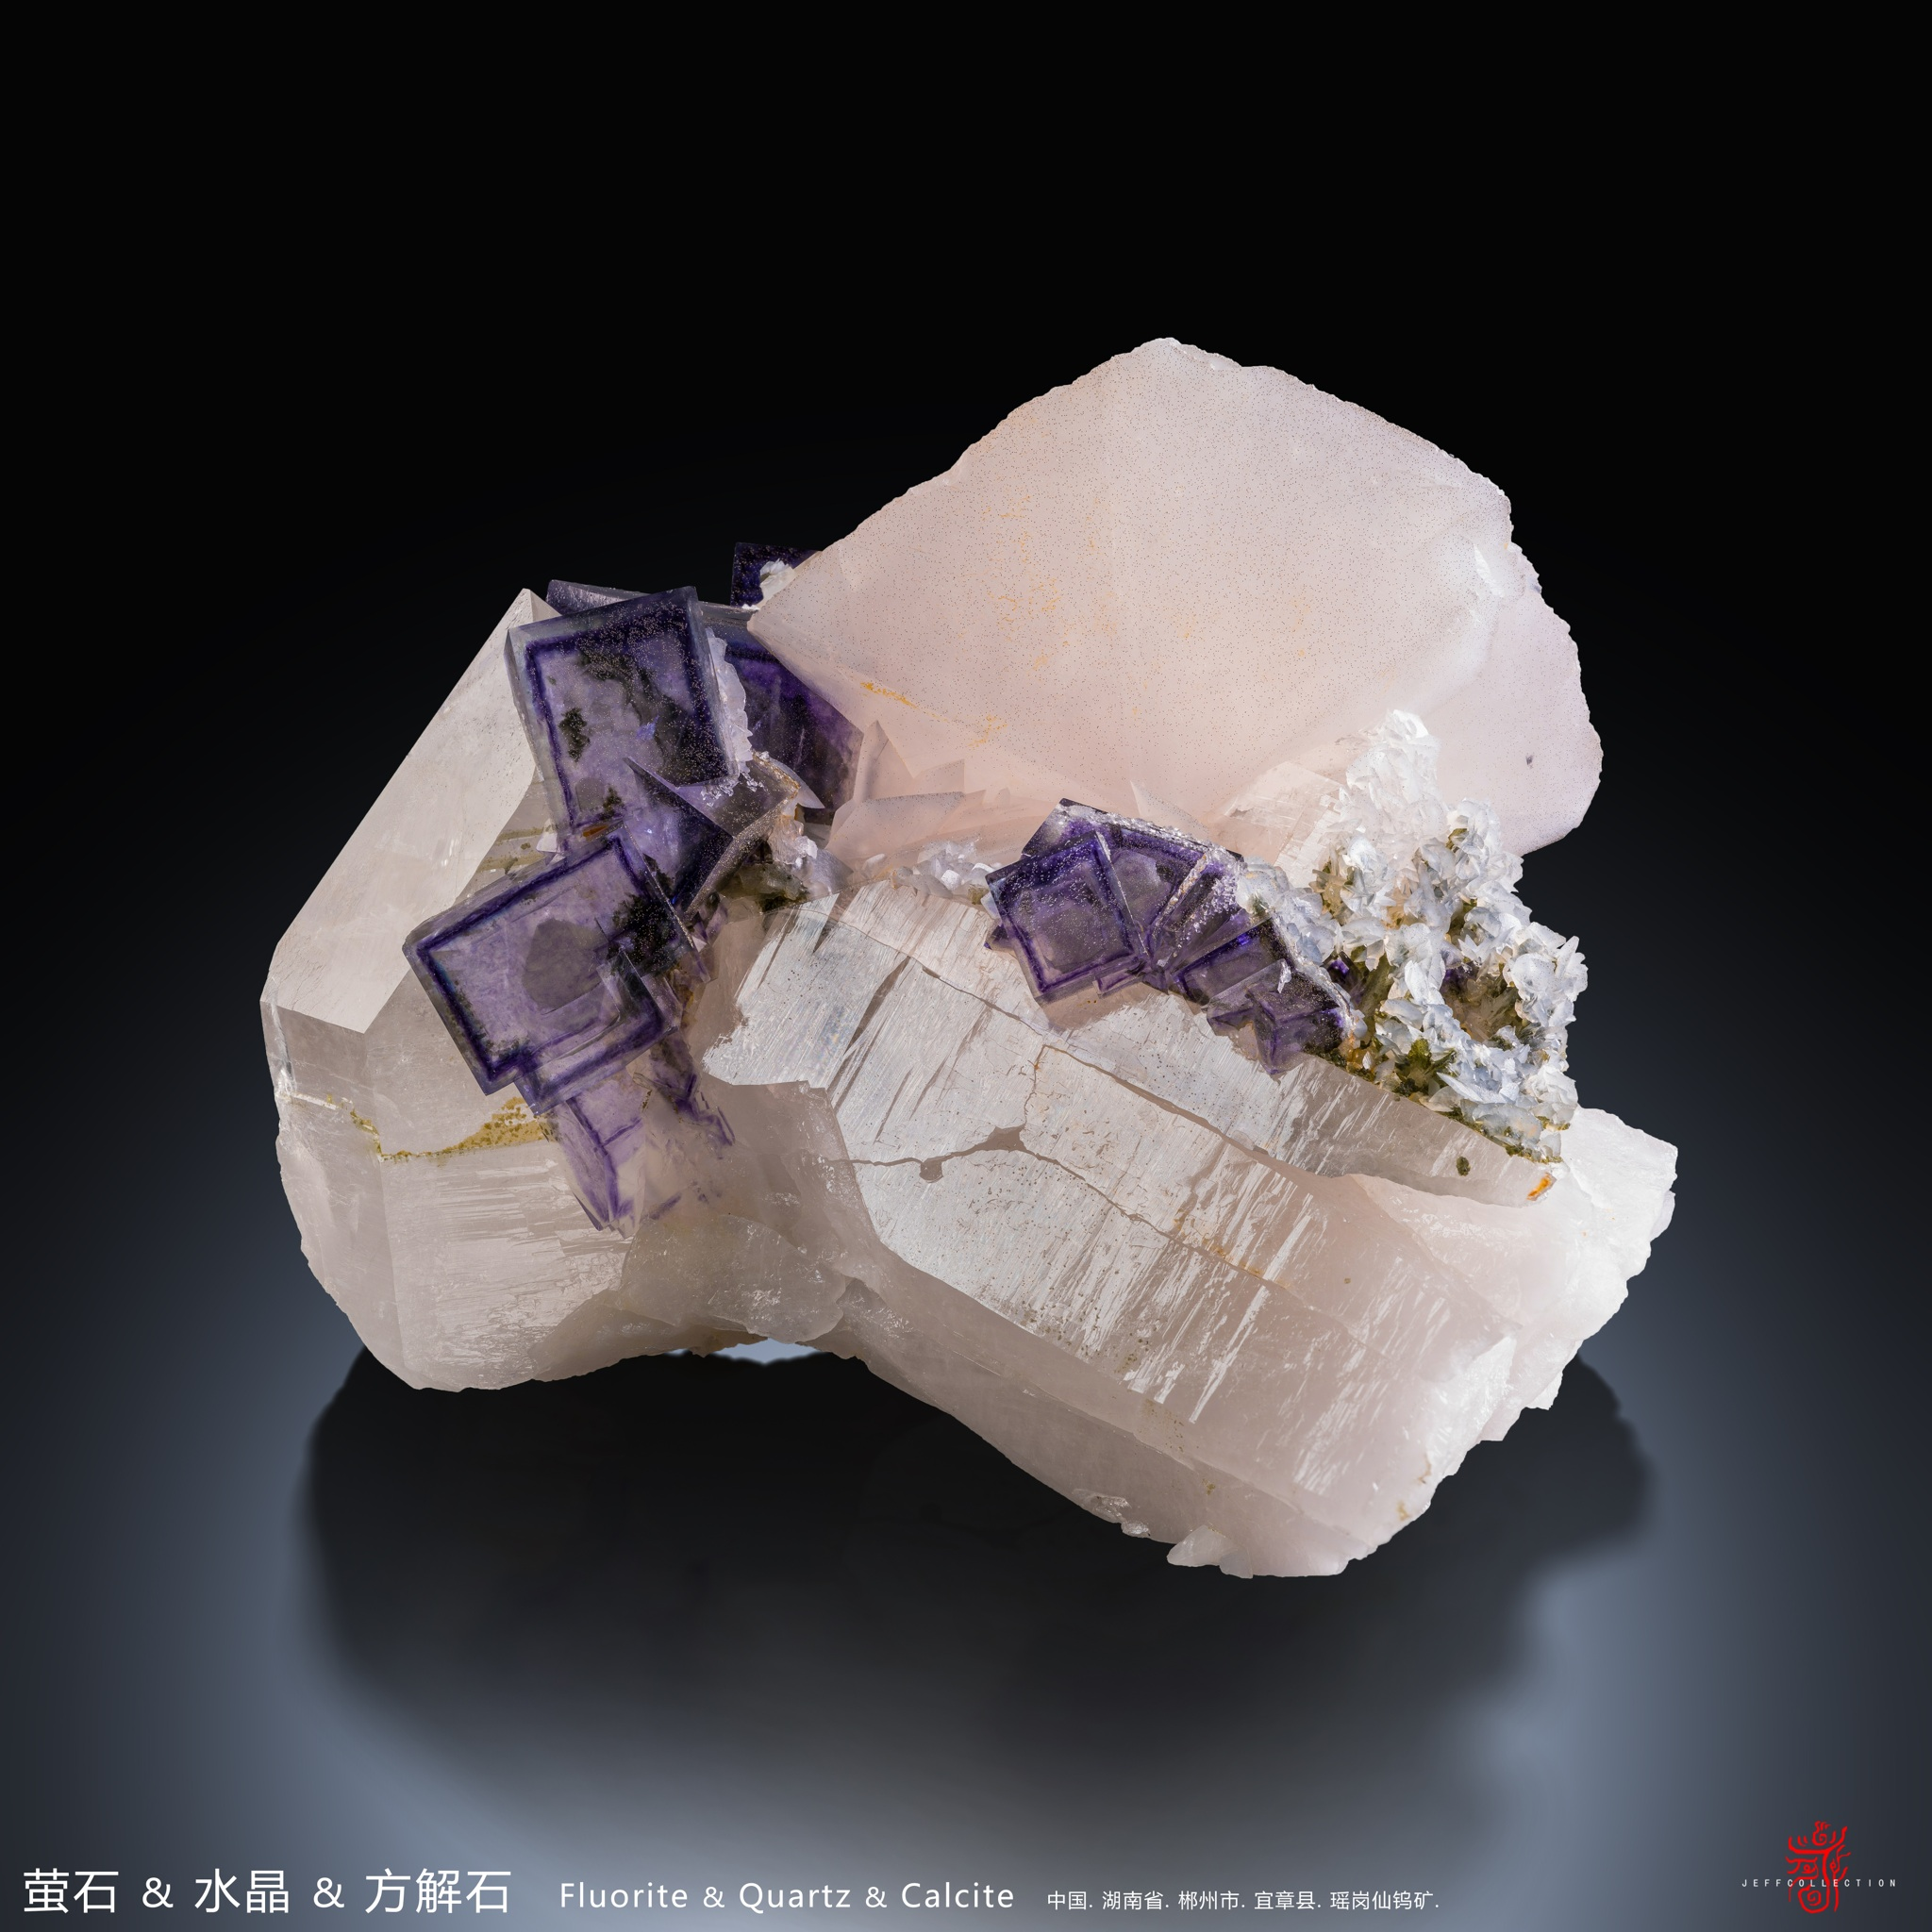 Wish Wang - 2B525091-6C94-4E1B-91D1-725F